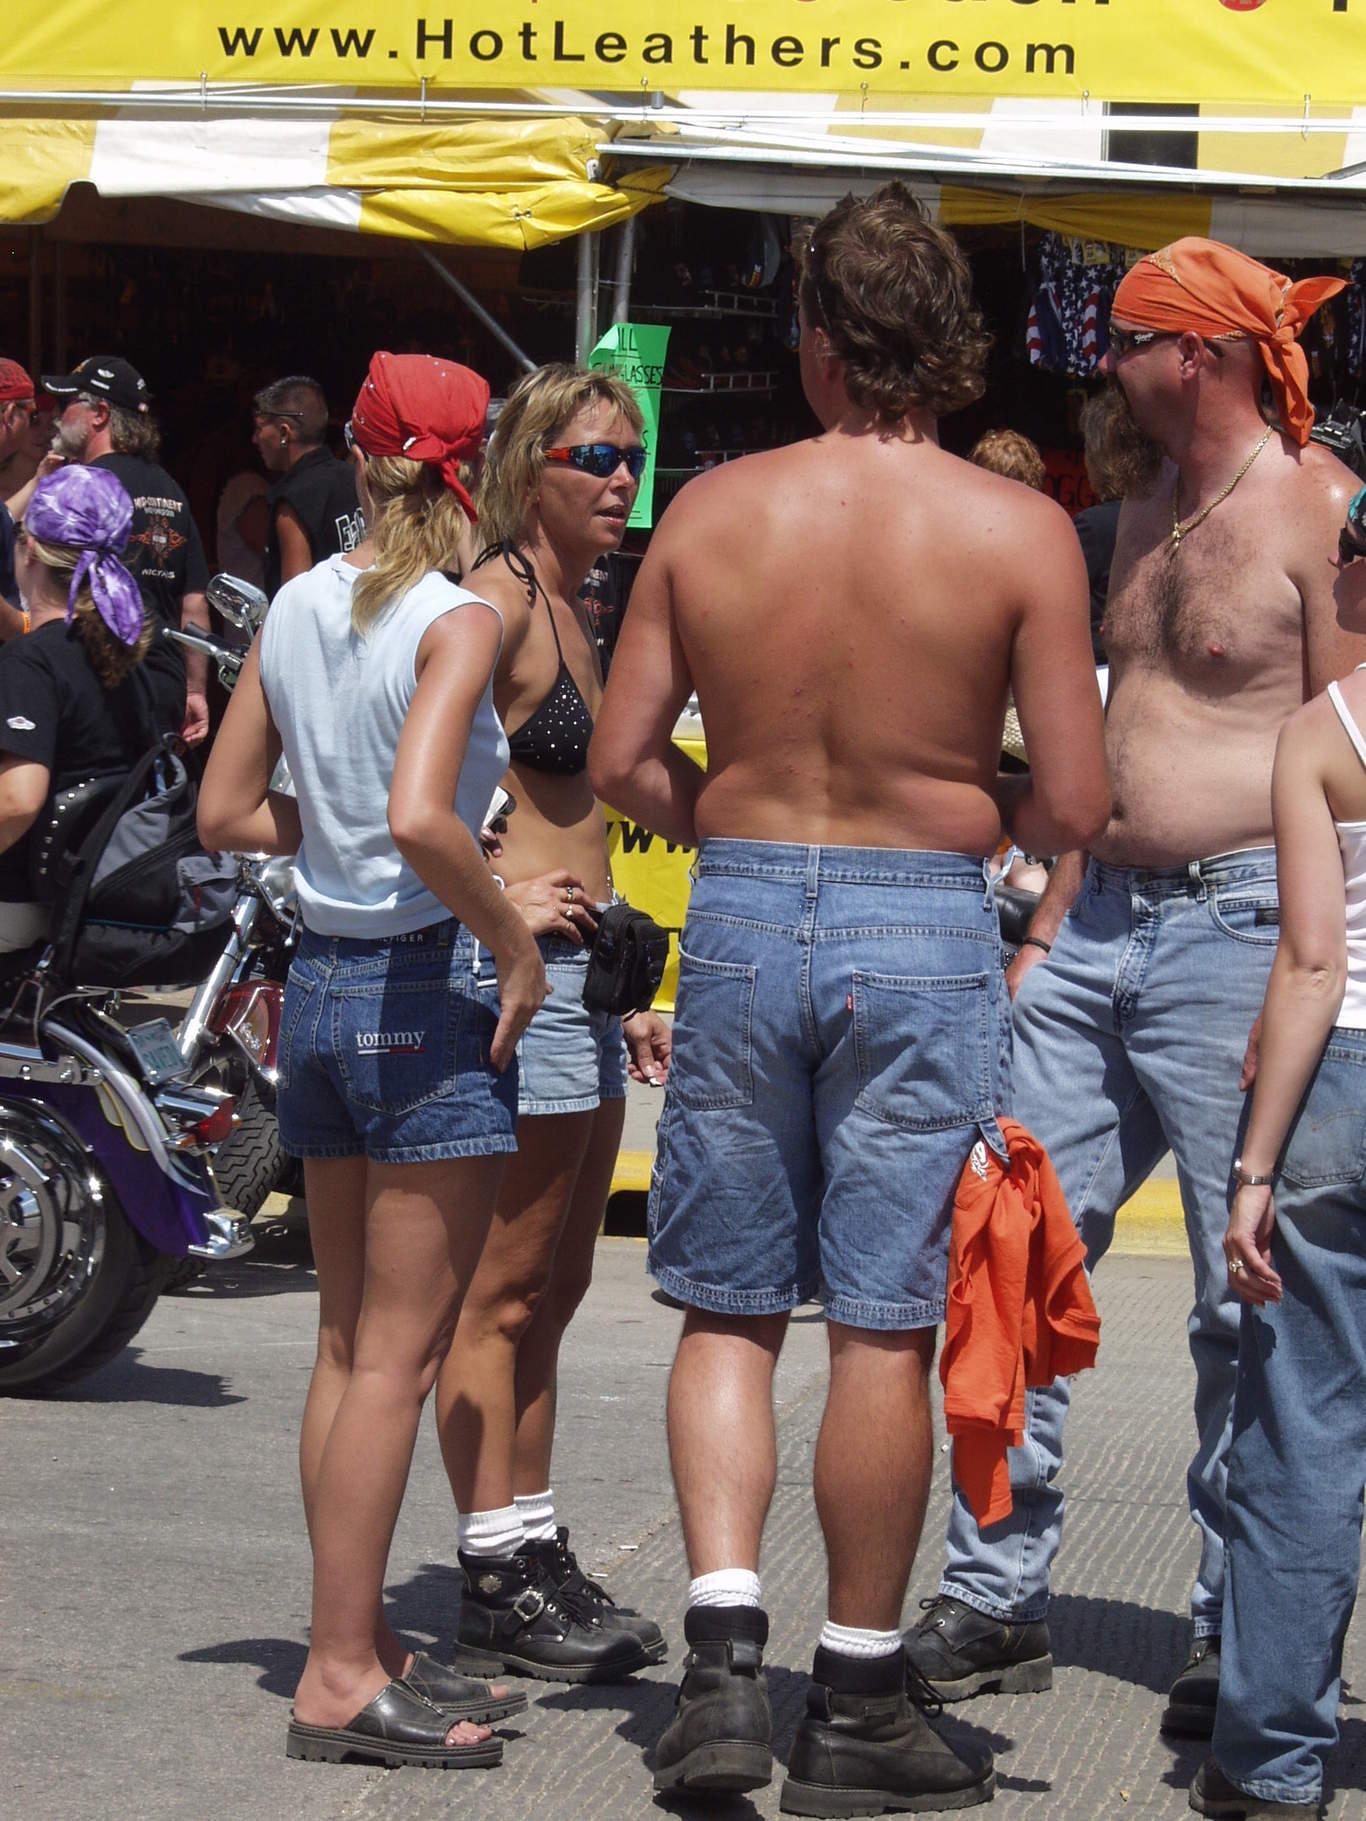 biker gathering